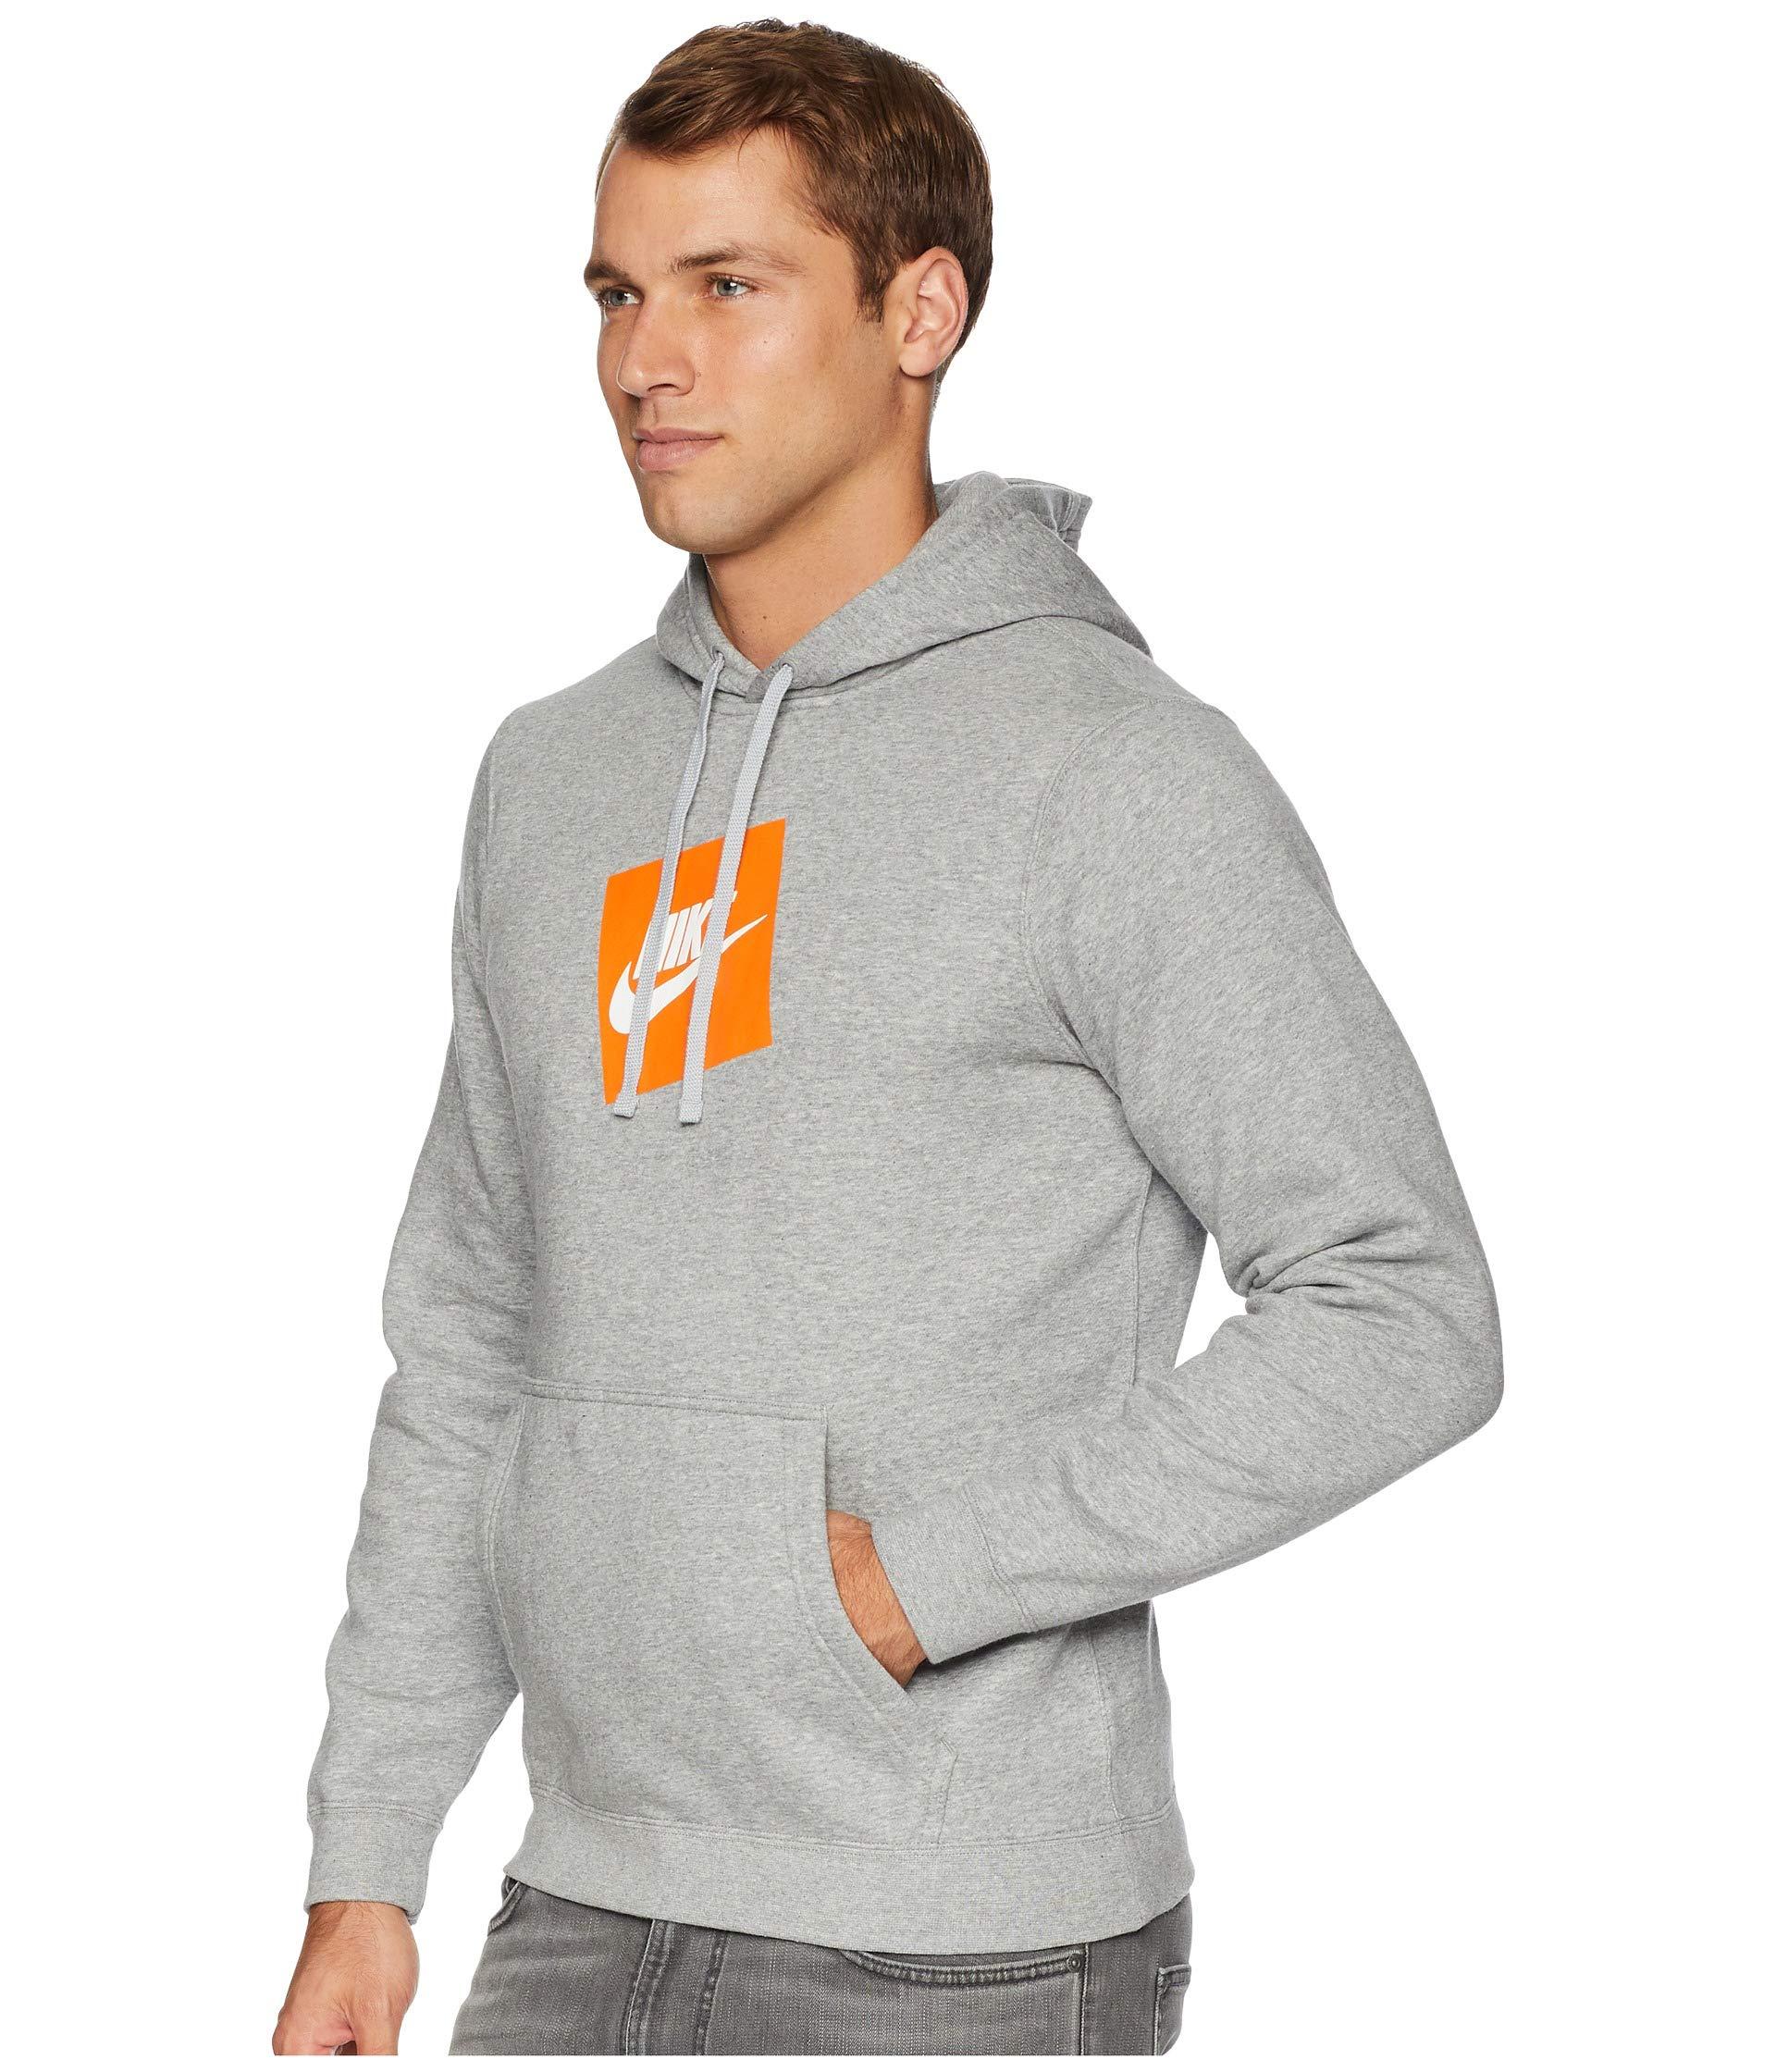 Grey Fleece Hoodie Nsw Pullover Heather Nike Dark Hybrid nSwYTSqI